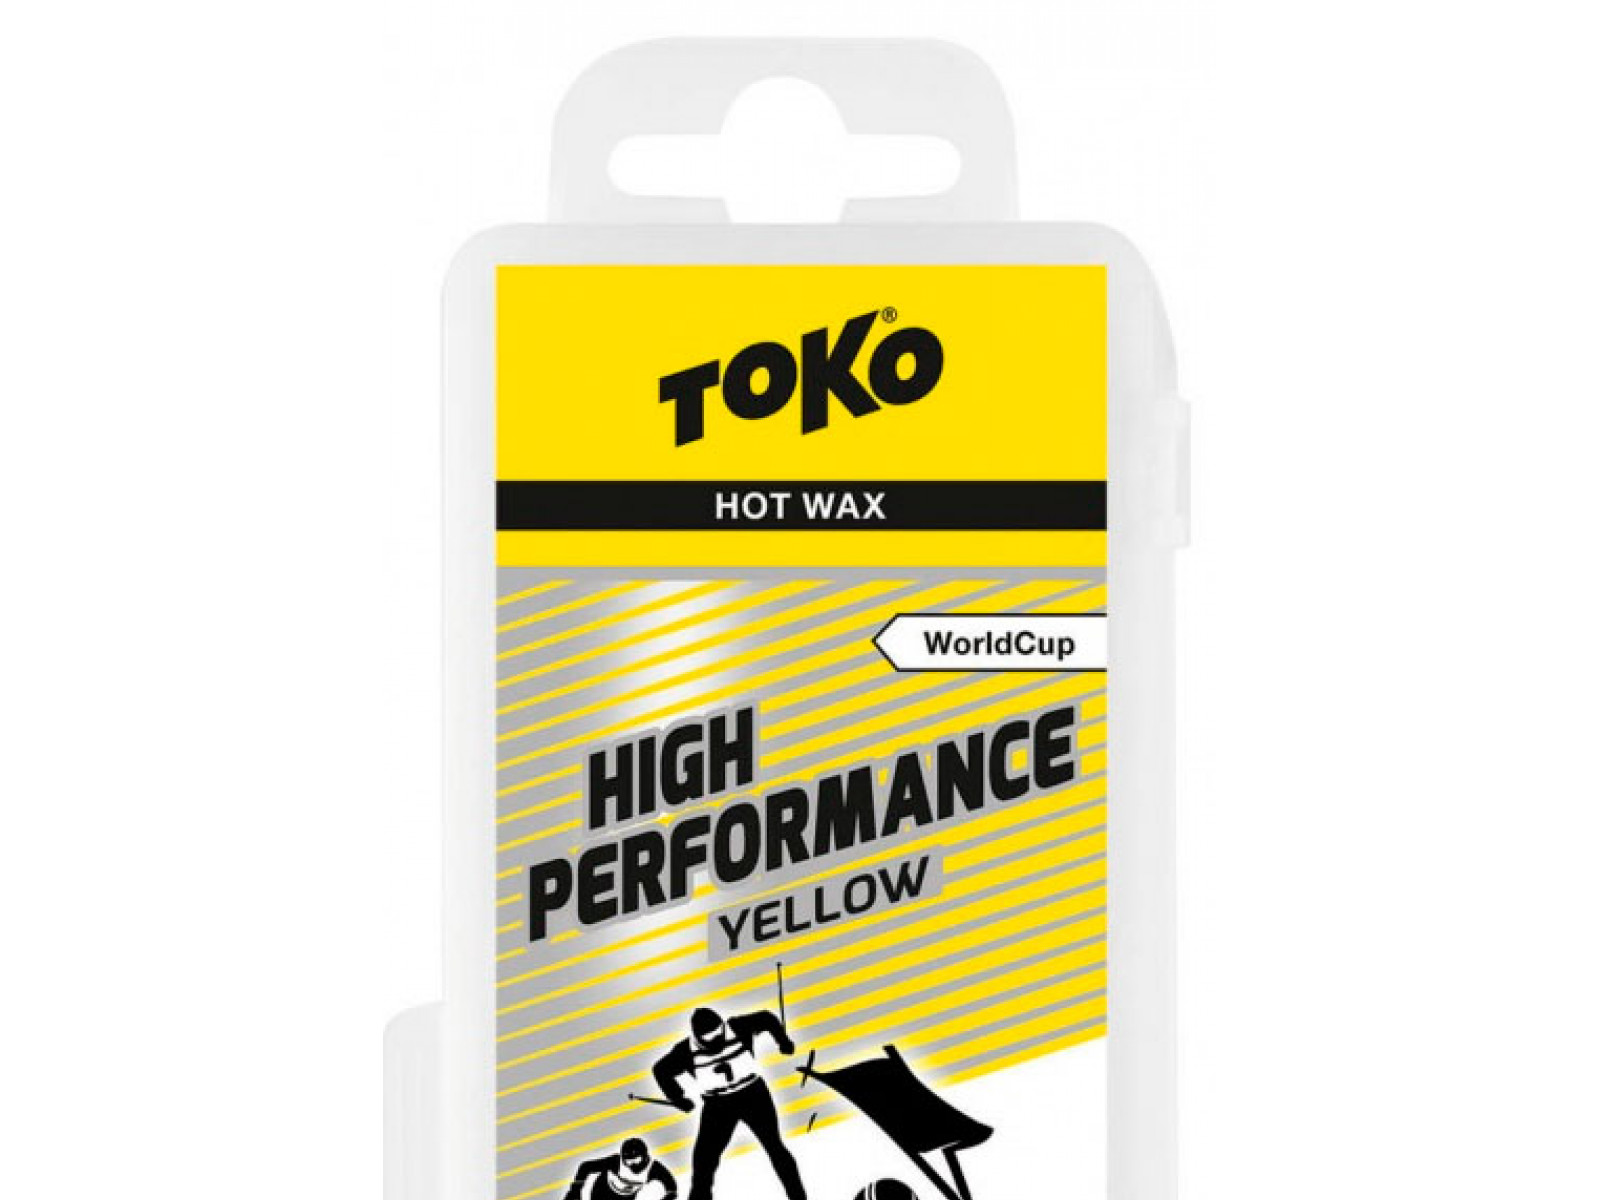 TOKO High Performance Hot Wax yellow 120g 2019/2020